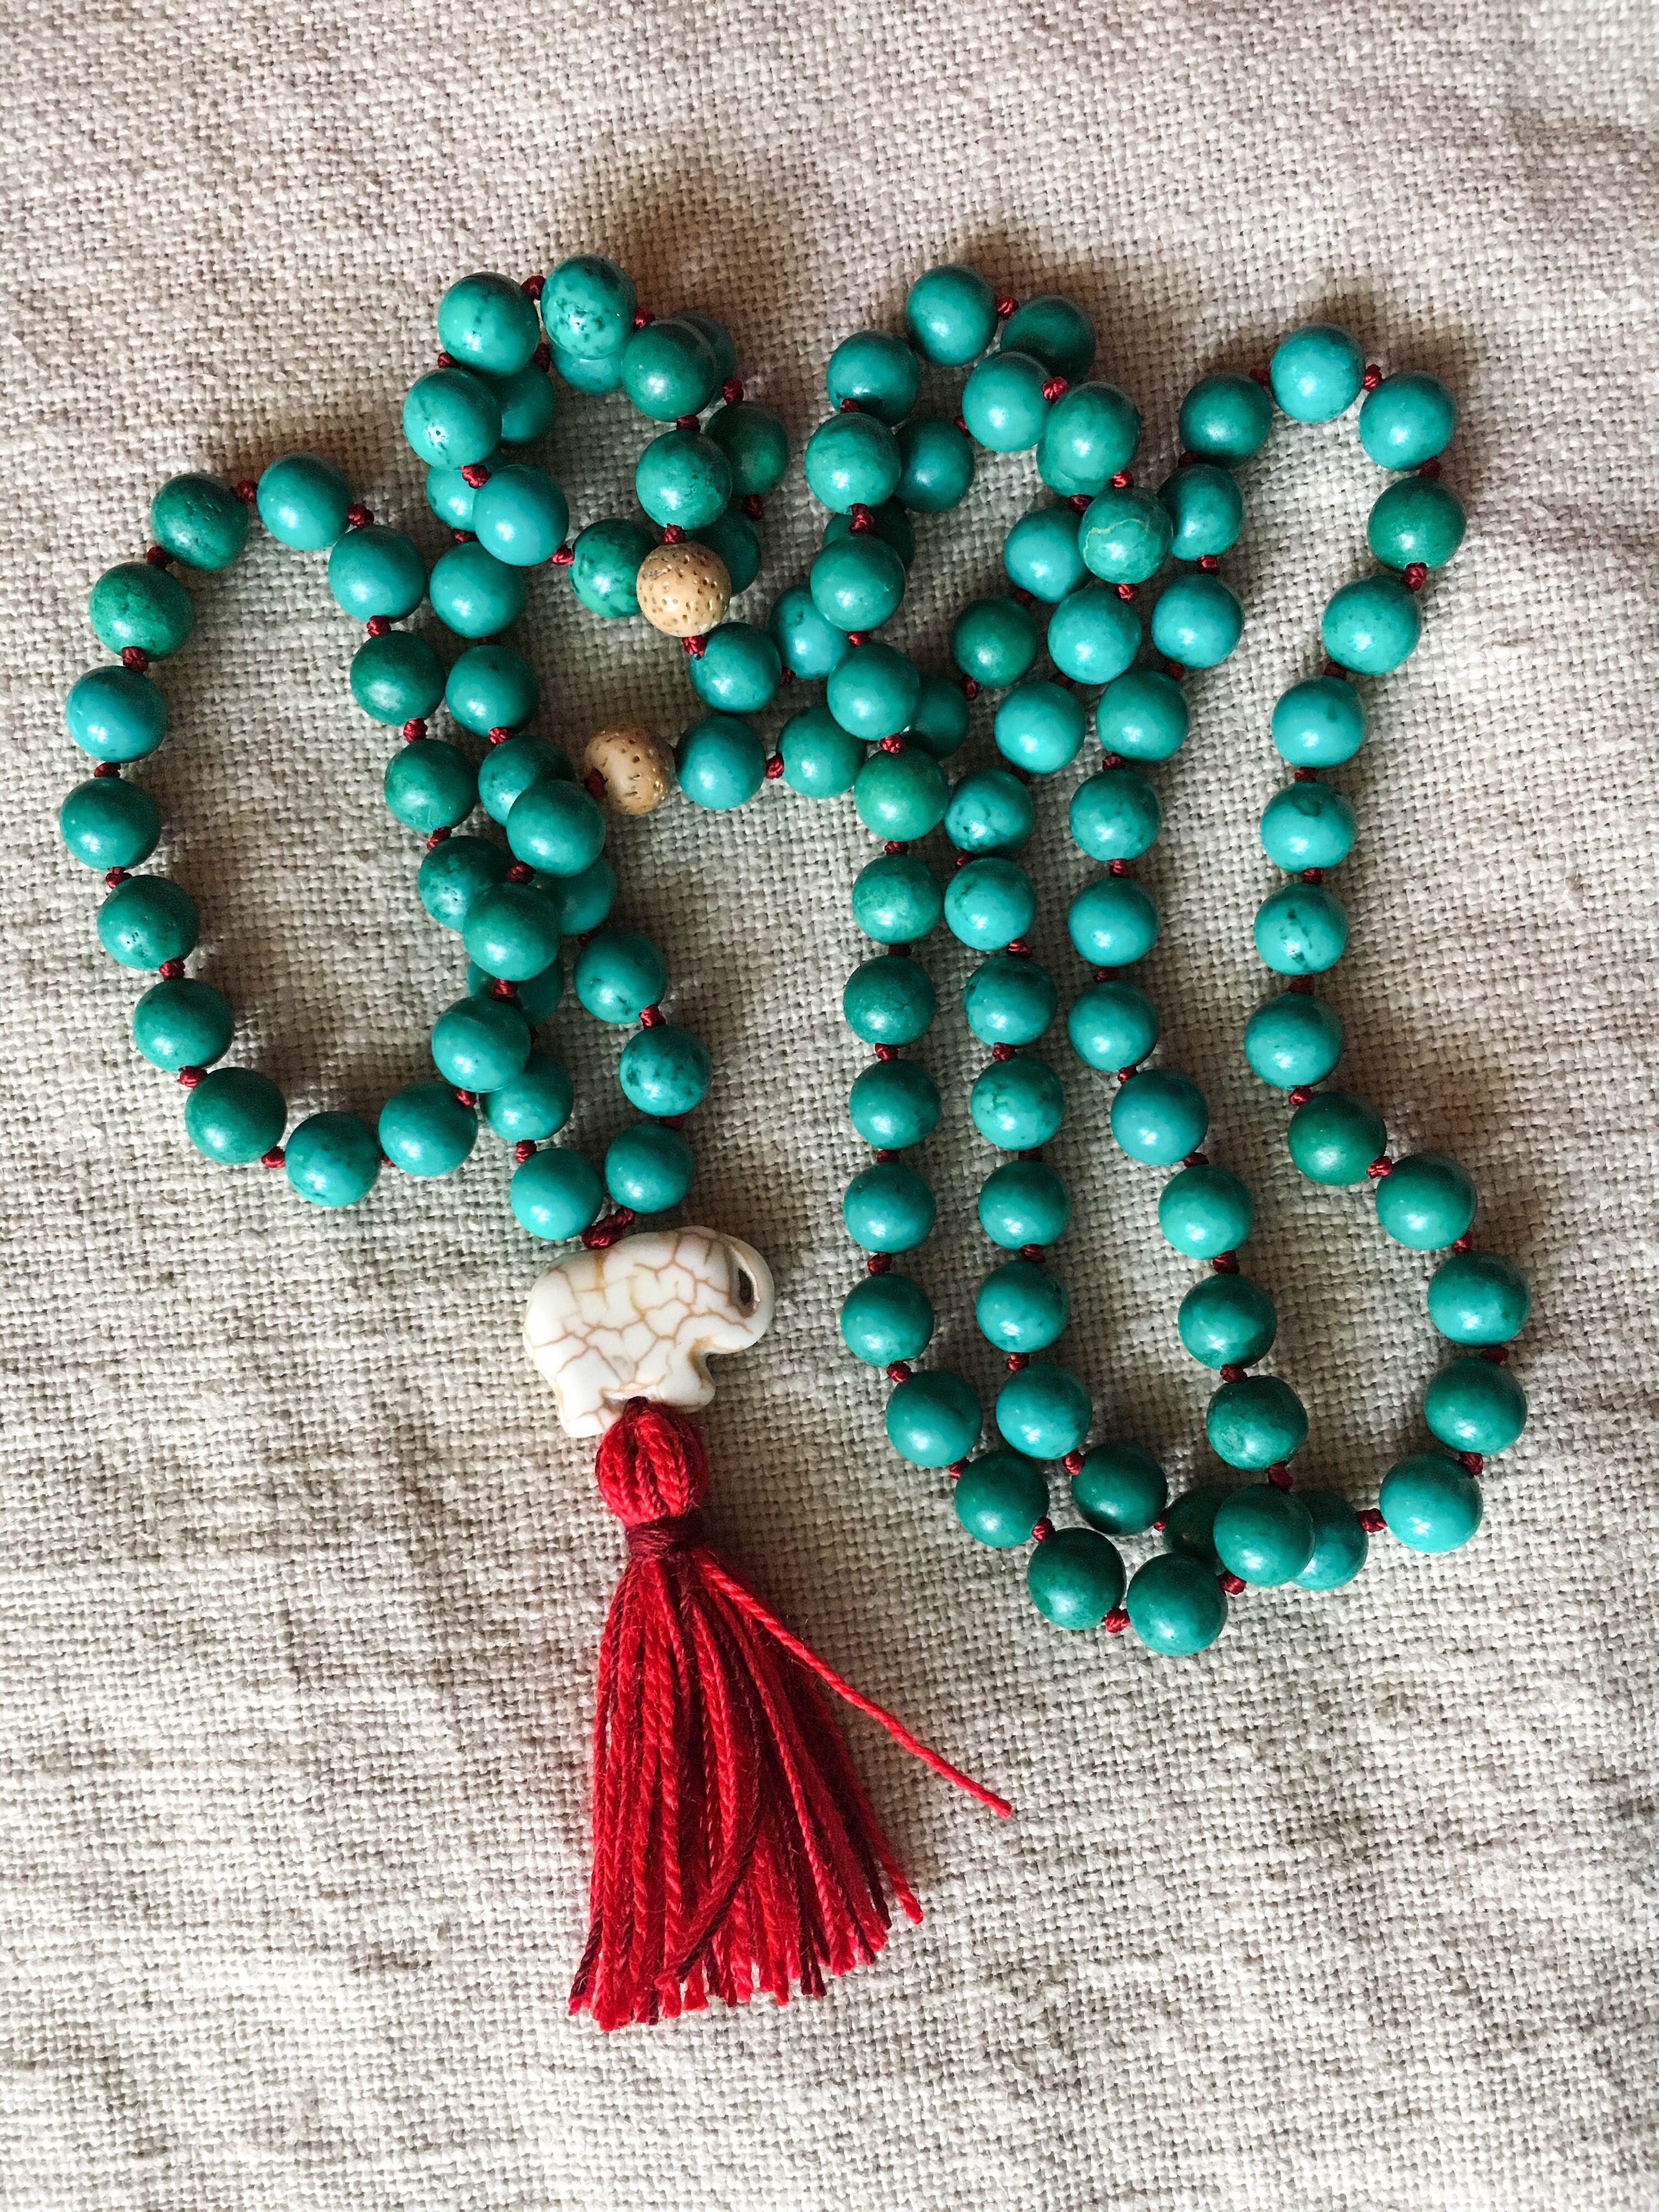 Turquoise Lotus Seed Elephant Mala Made Prayer Beads Mala Made